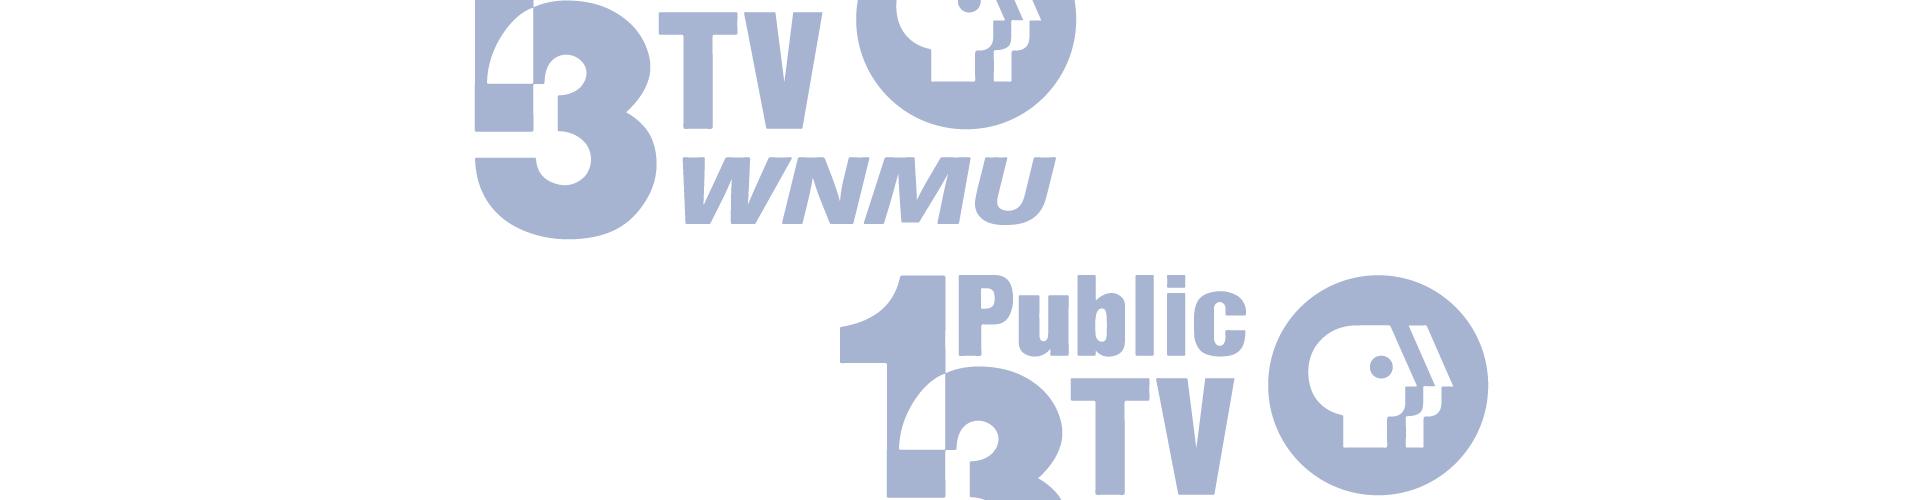 WNMU-TV 13